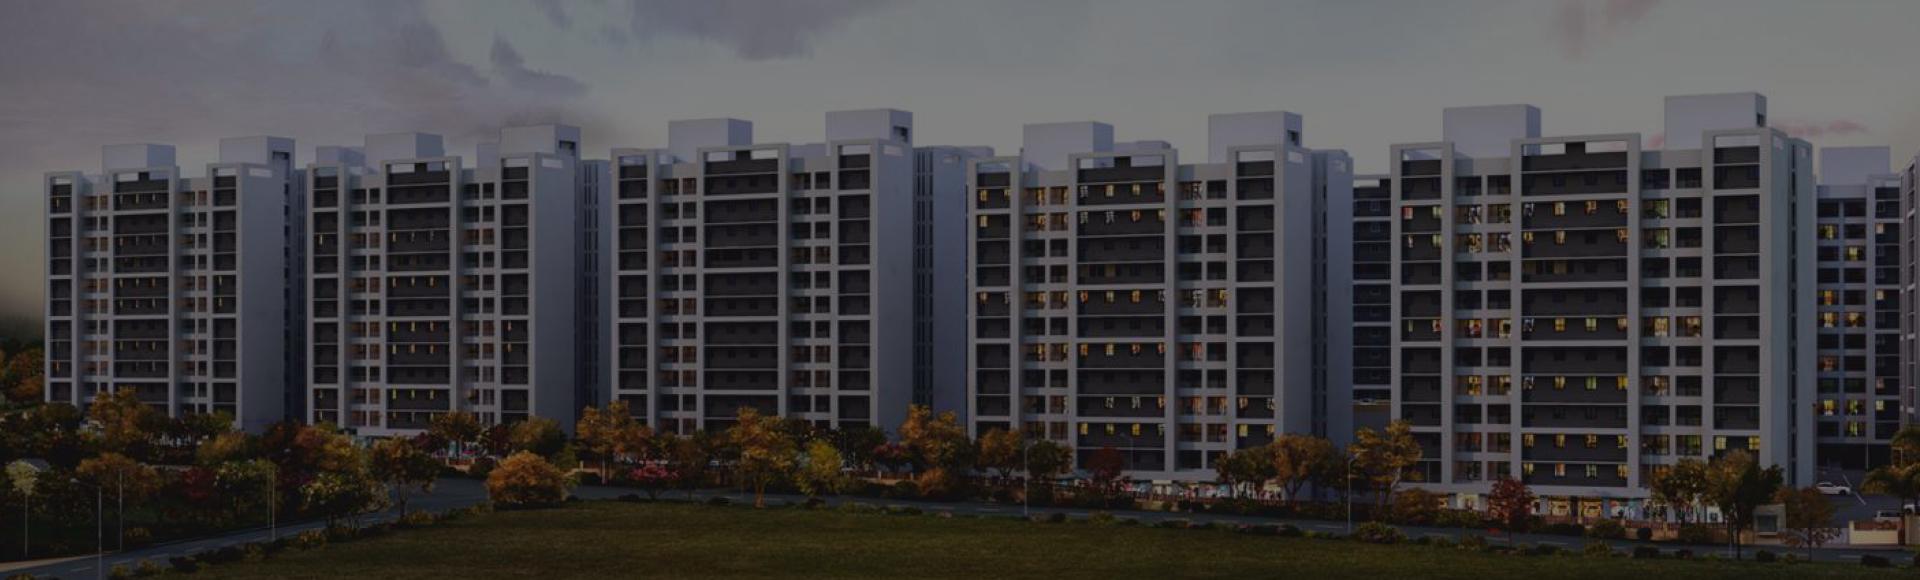 IVY Estate Kolte-Patil